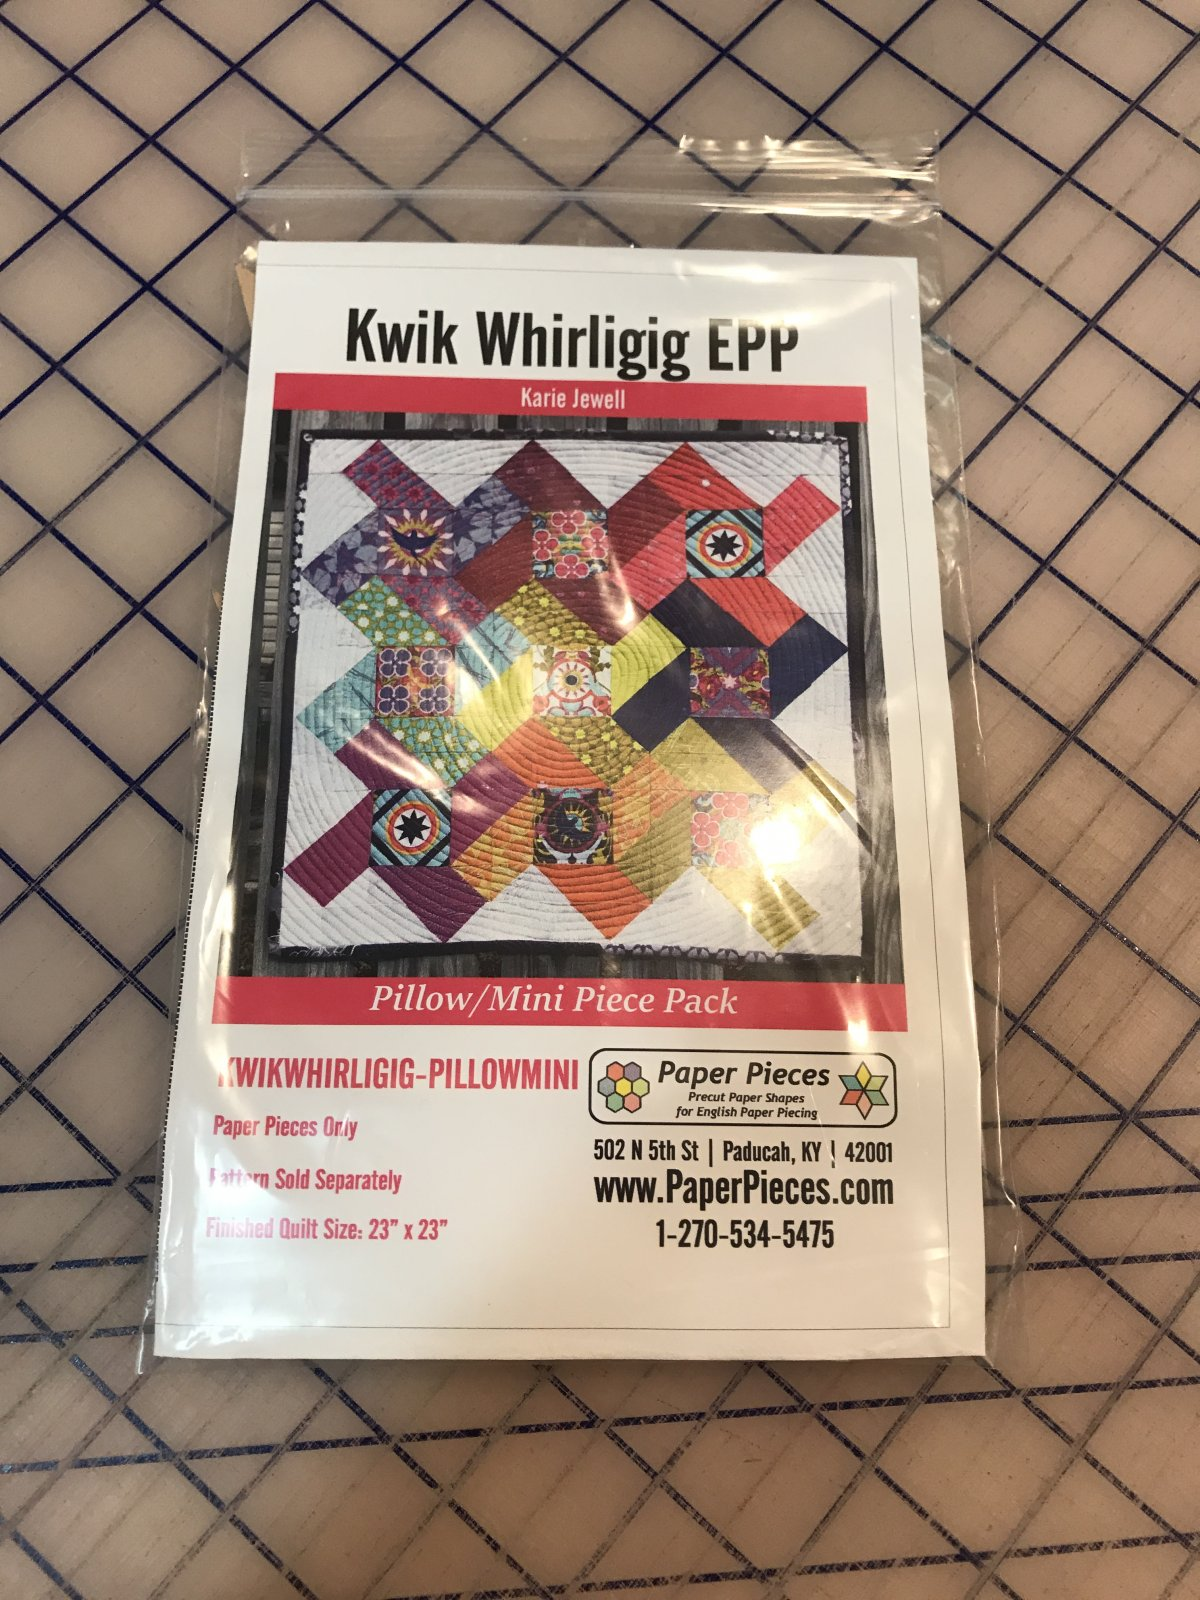 Kwik Whirligig - PIECES PILLOW/MINI